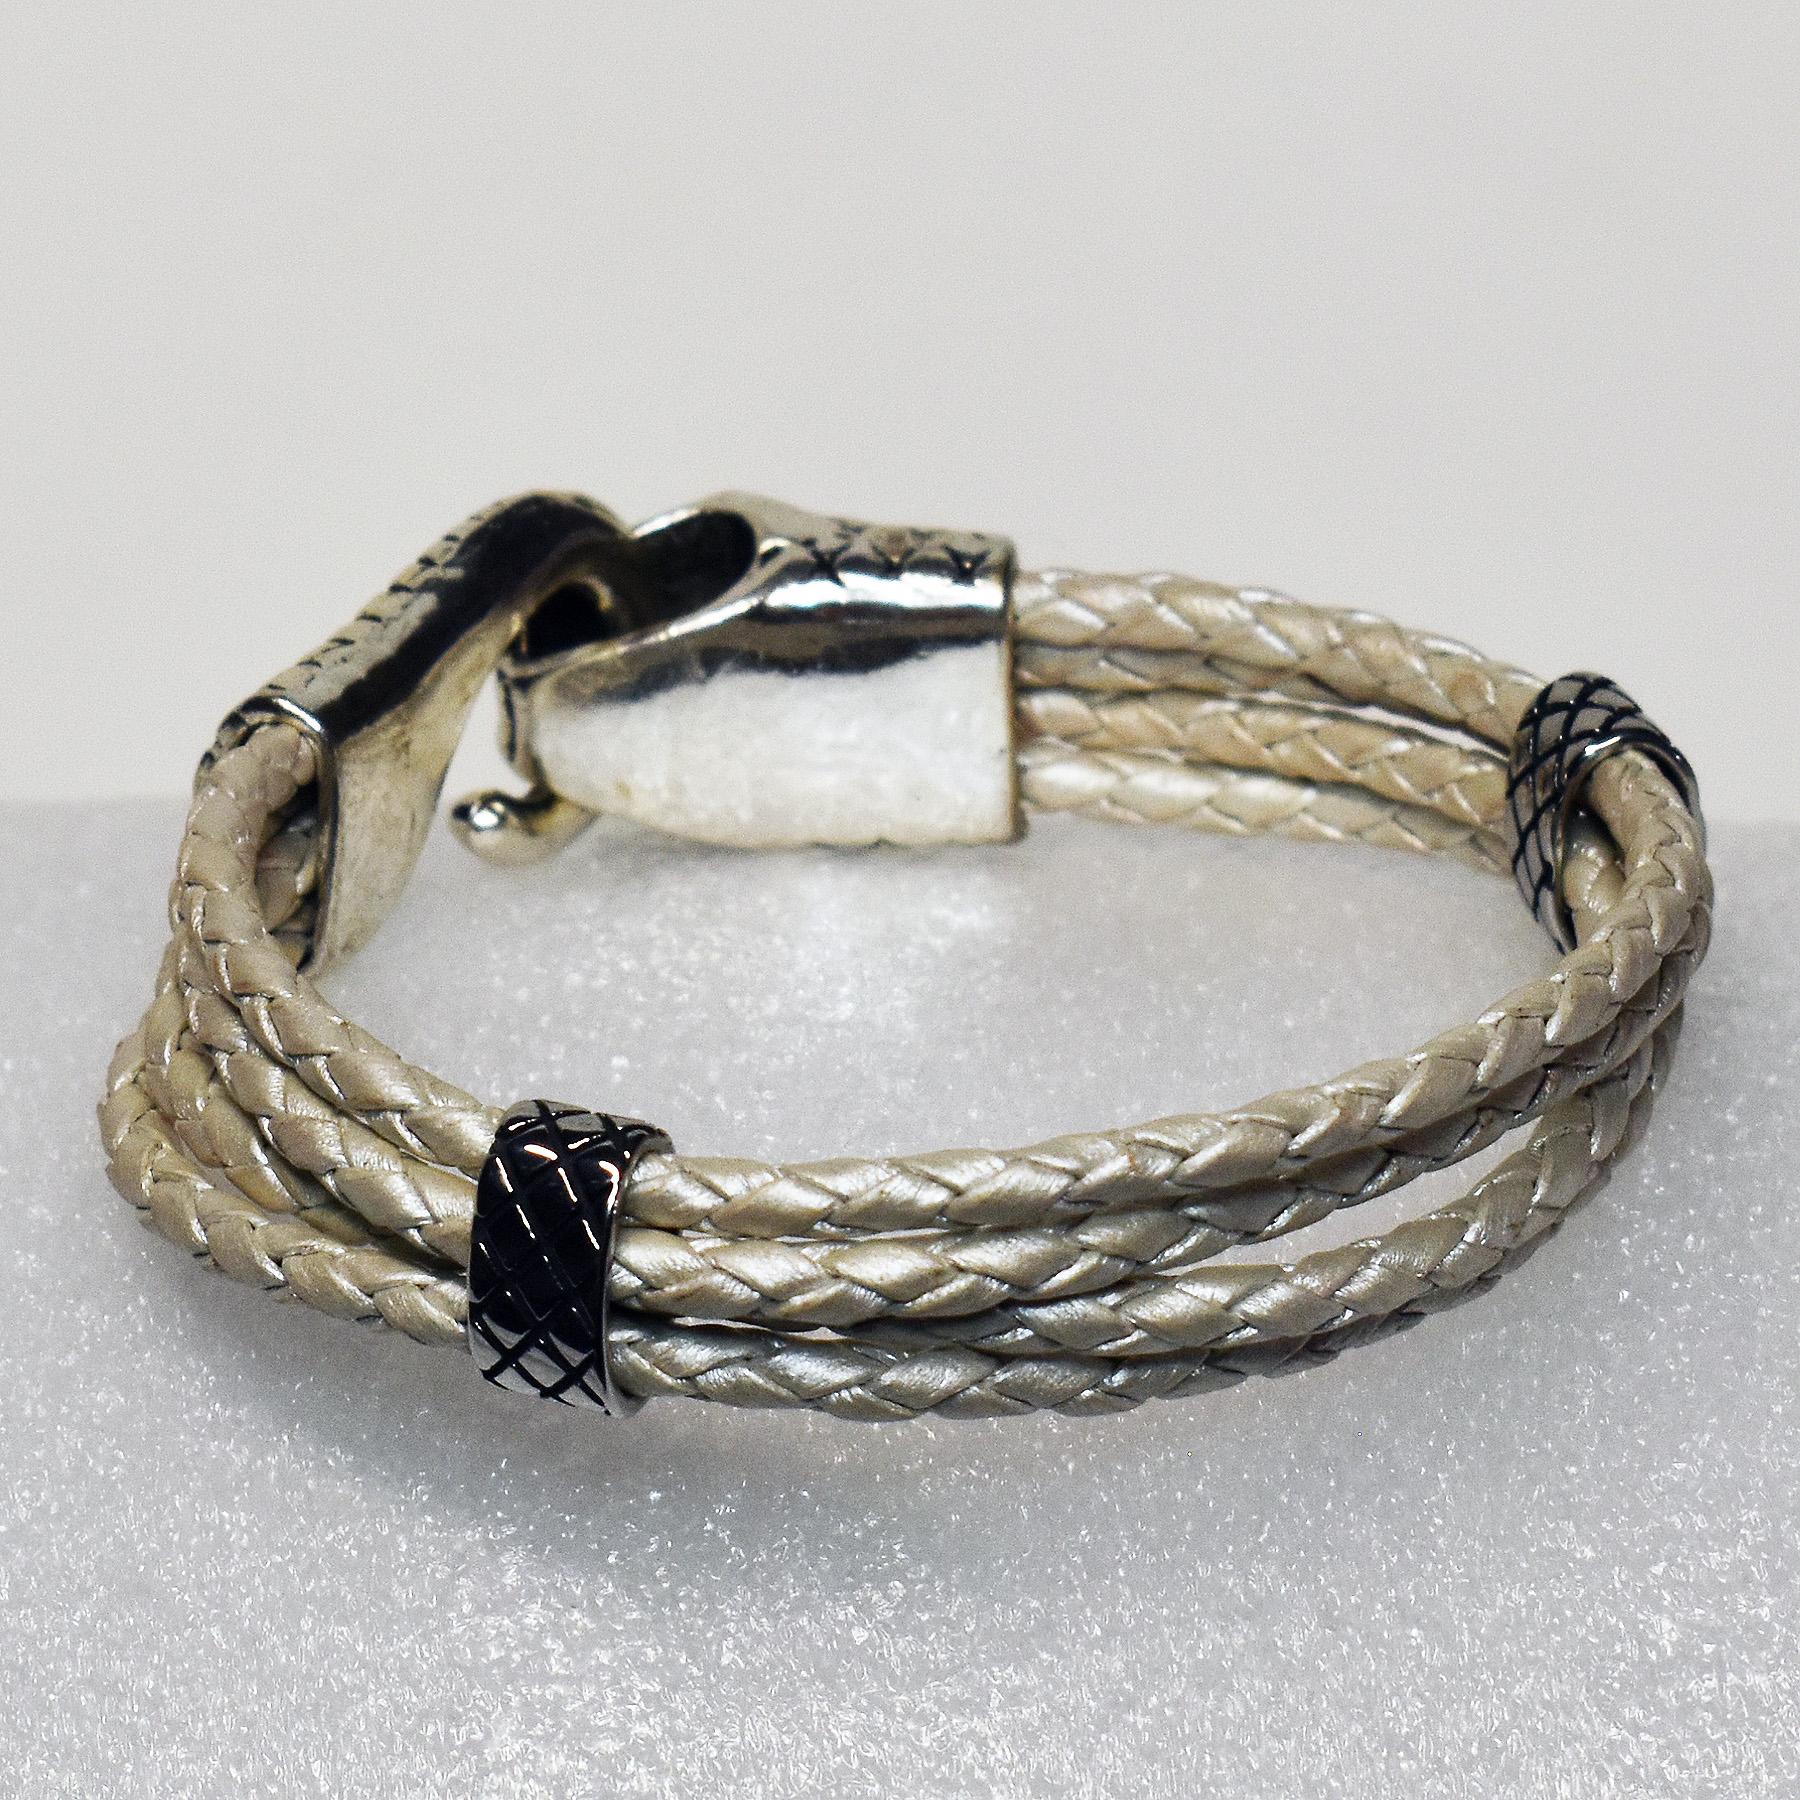 JekylsHydes_Bracelets__0015_011B